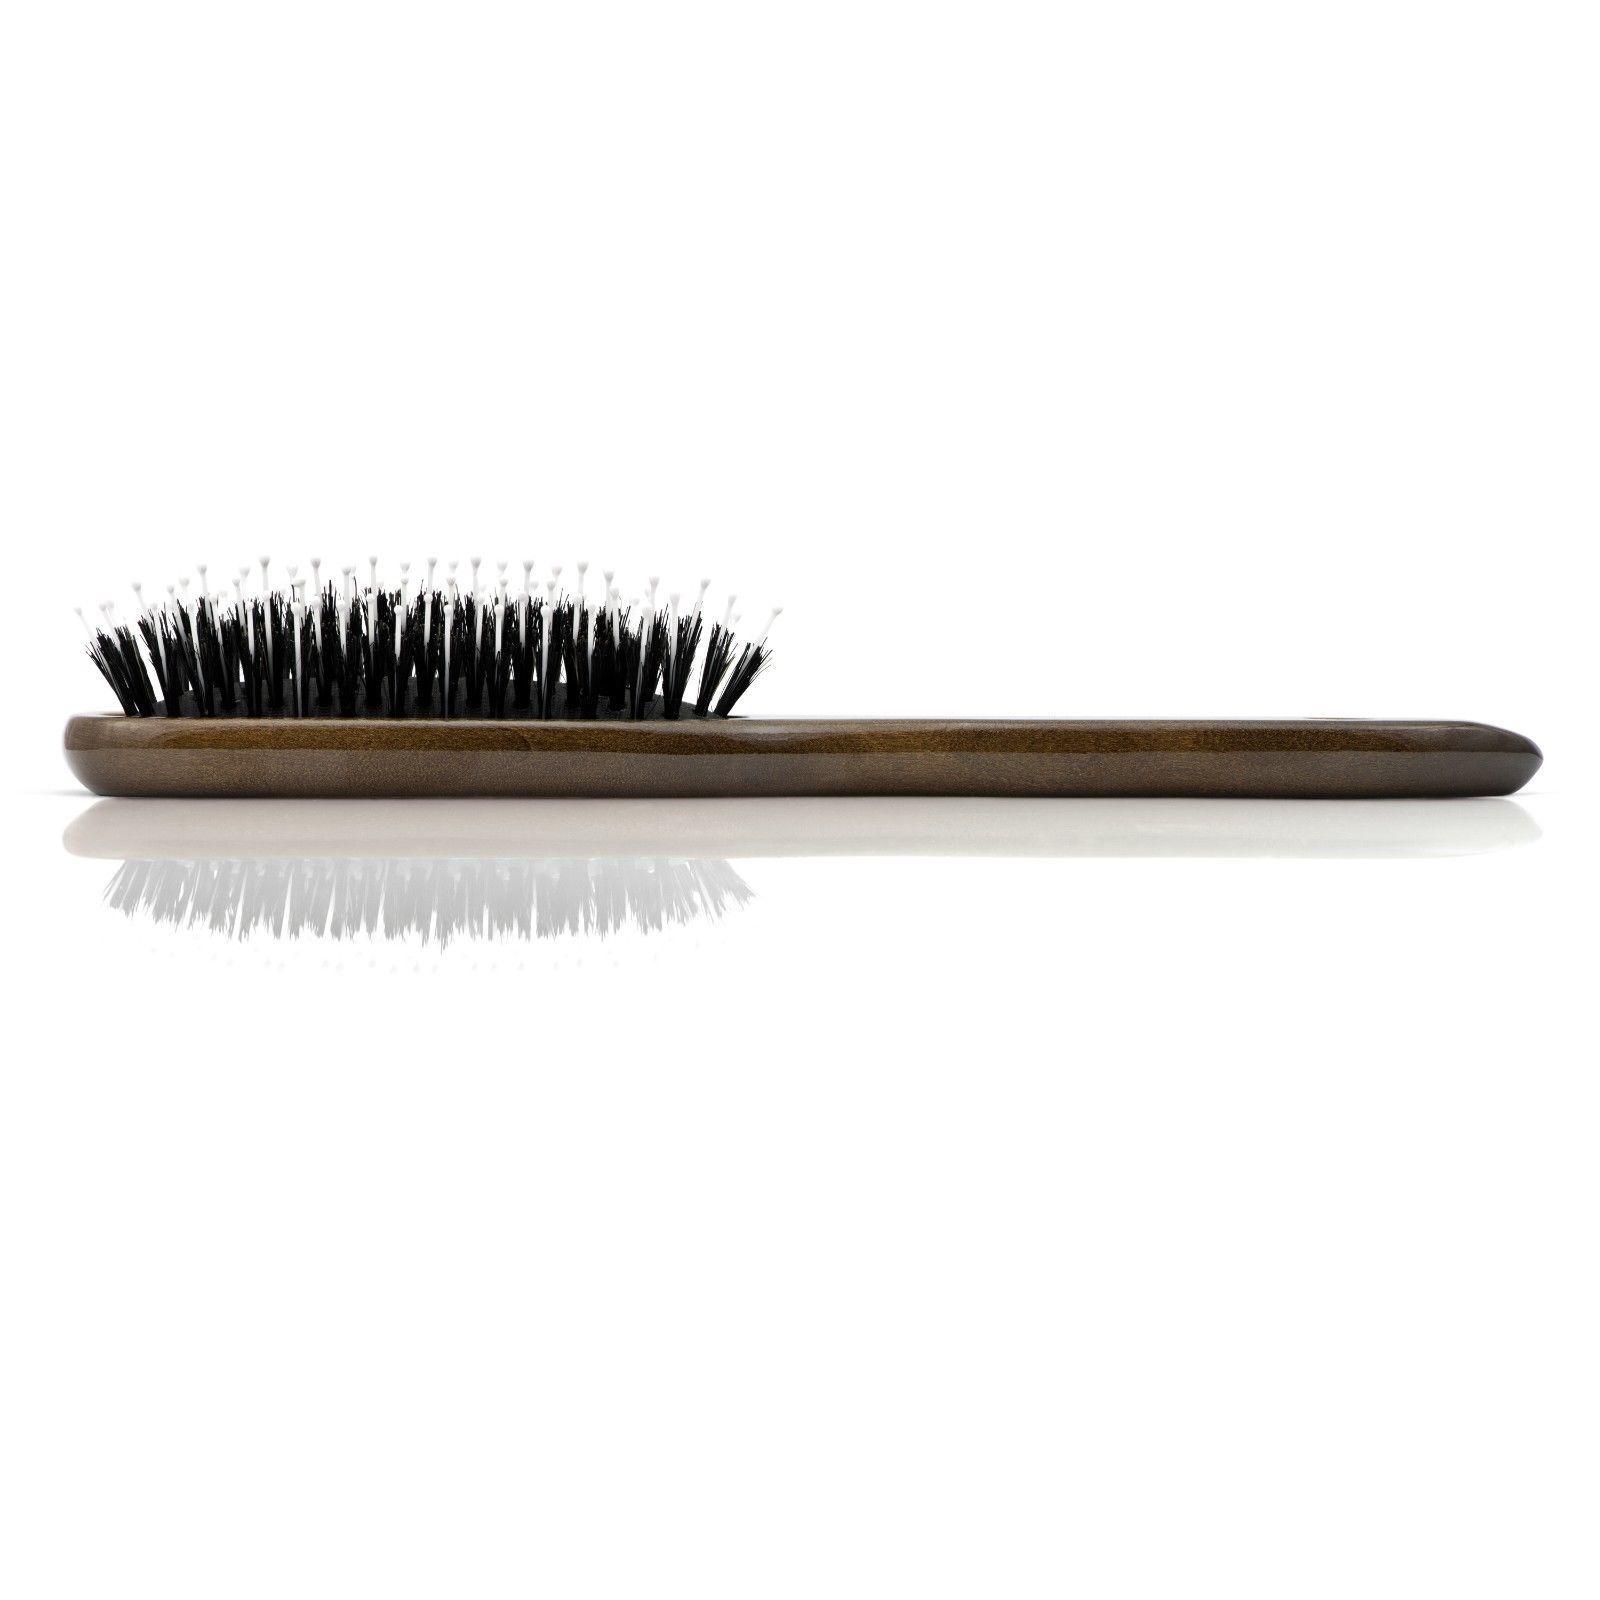 "Mont Bleu Hair Brush HBMB-18.5 made with SWAROVSKI ""Wave Green"" Elements"